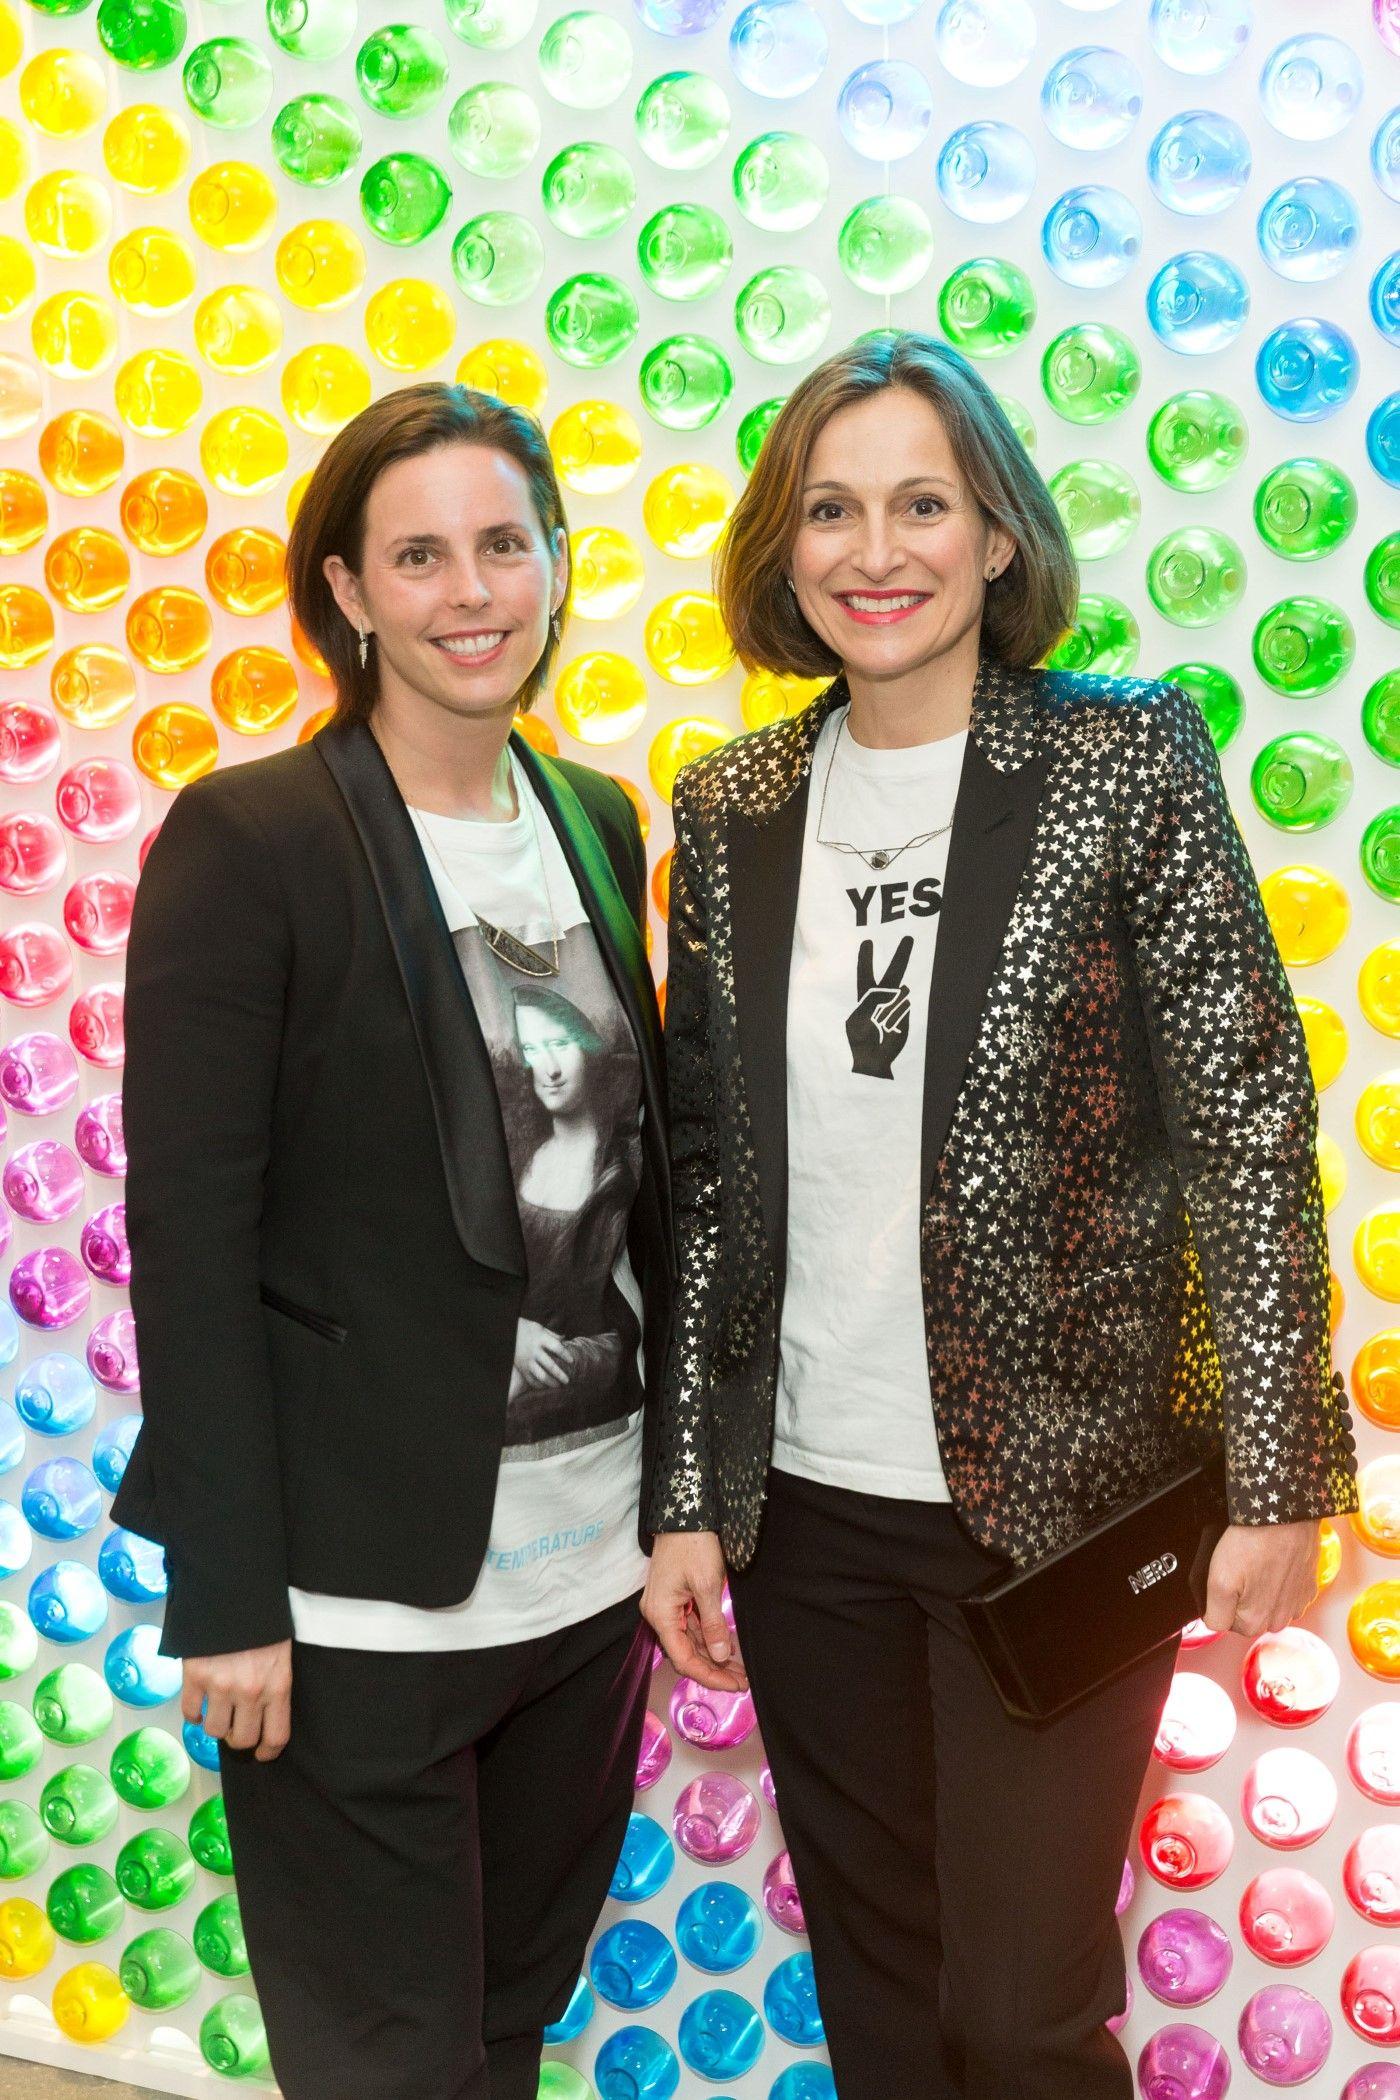 Jessica Silverman and Sarah Thornton